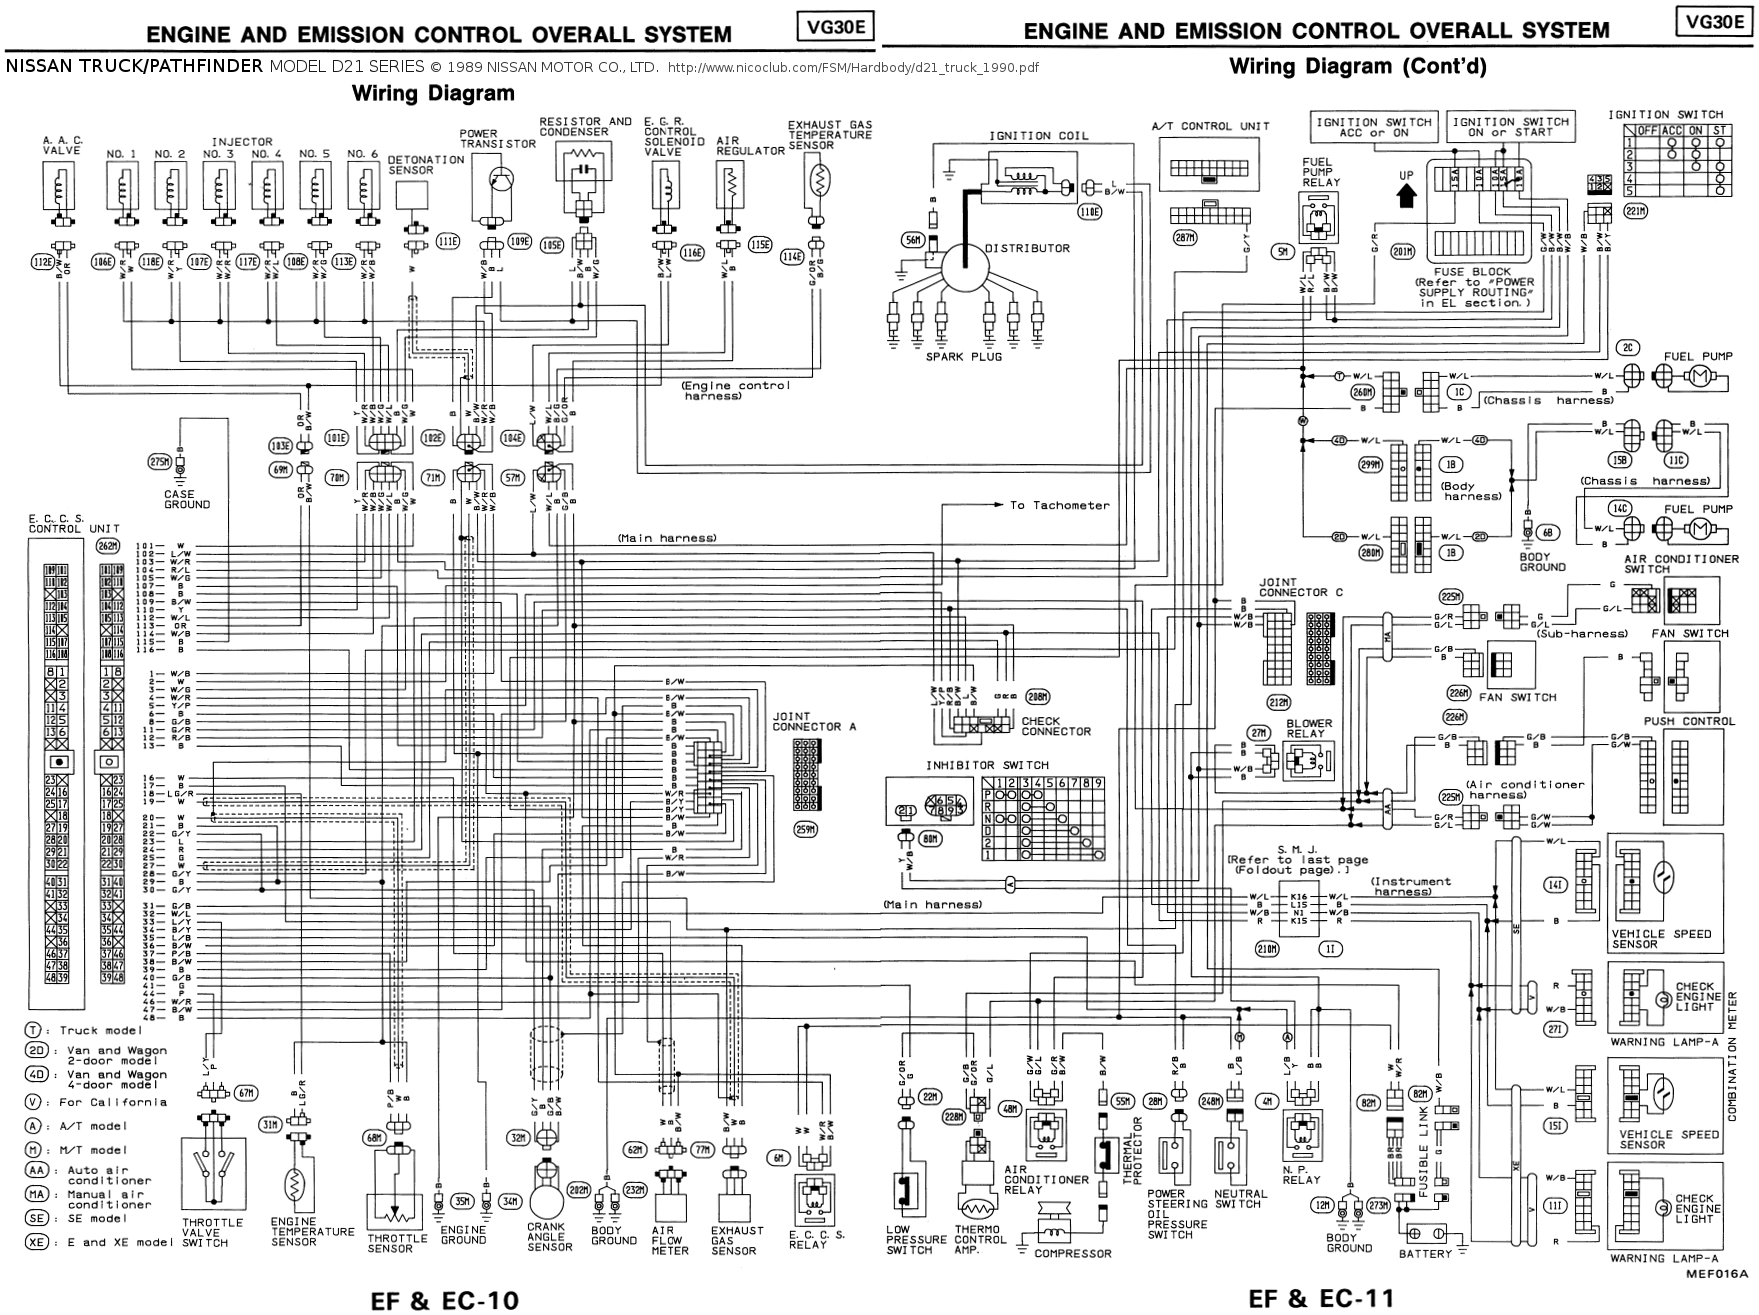 1990 nissan pickup wiring diagram - wiring diagram system good-locate-a -  good-locate-a.ediliadesign.it  ediliadesign.it